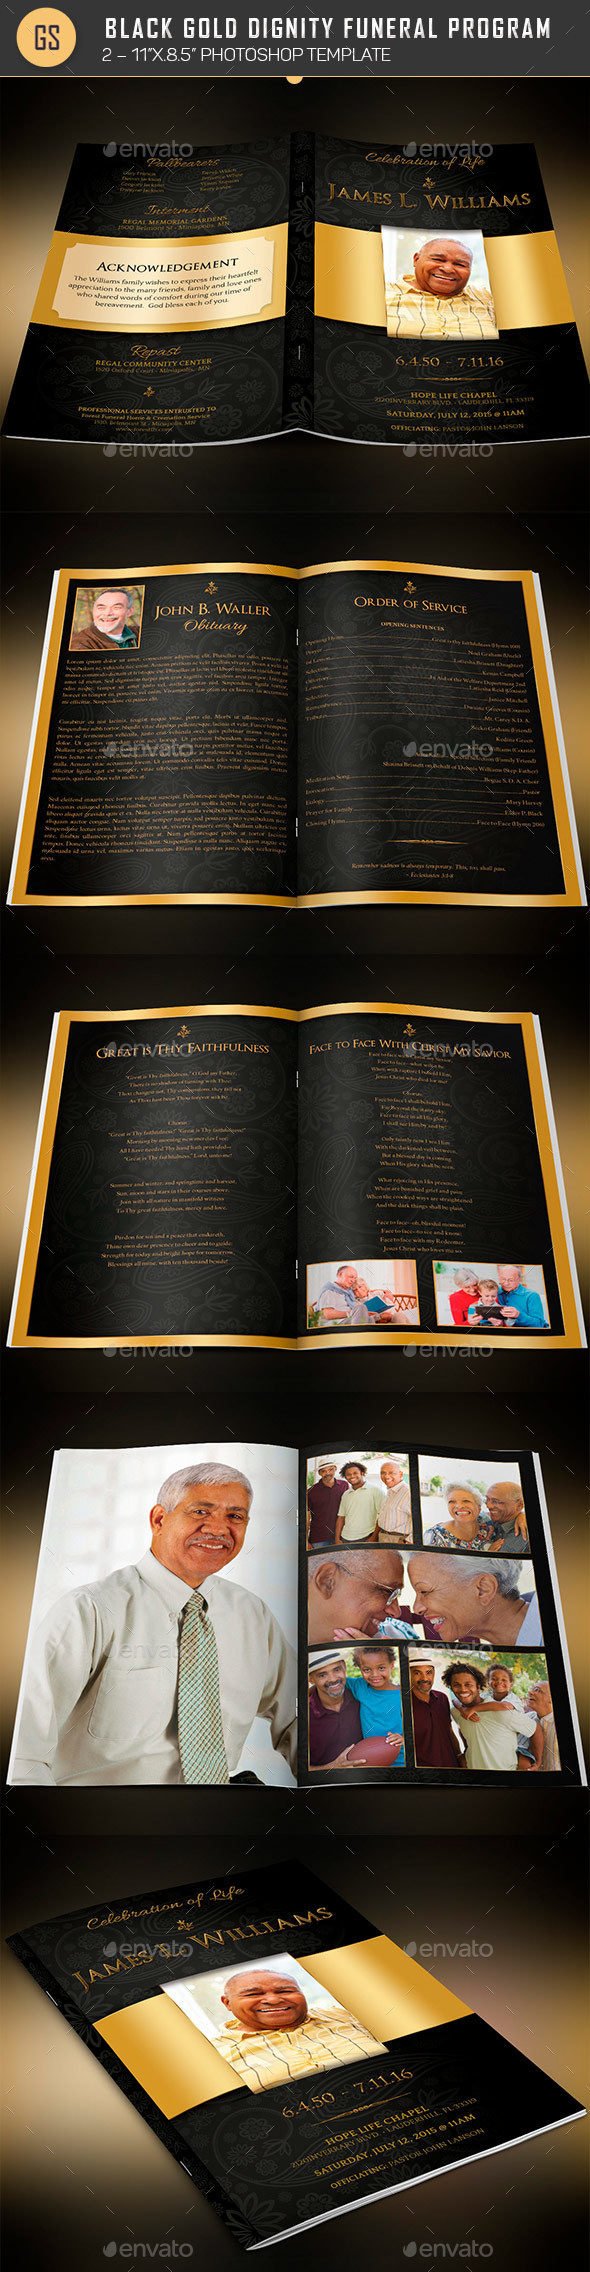 Black Gold Dignity Funeral Program Template - Informational Brochures